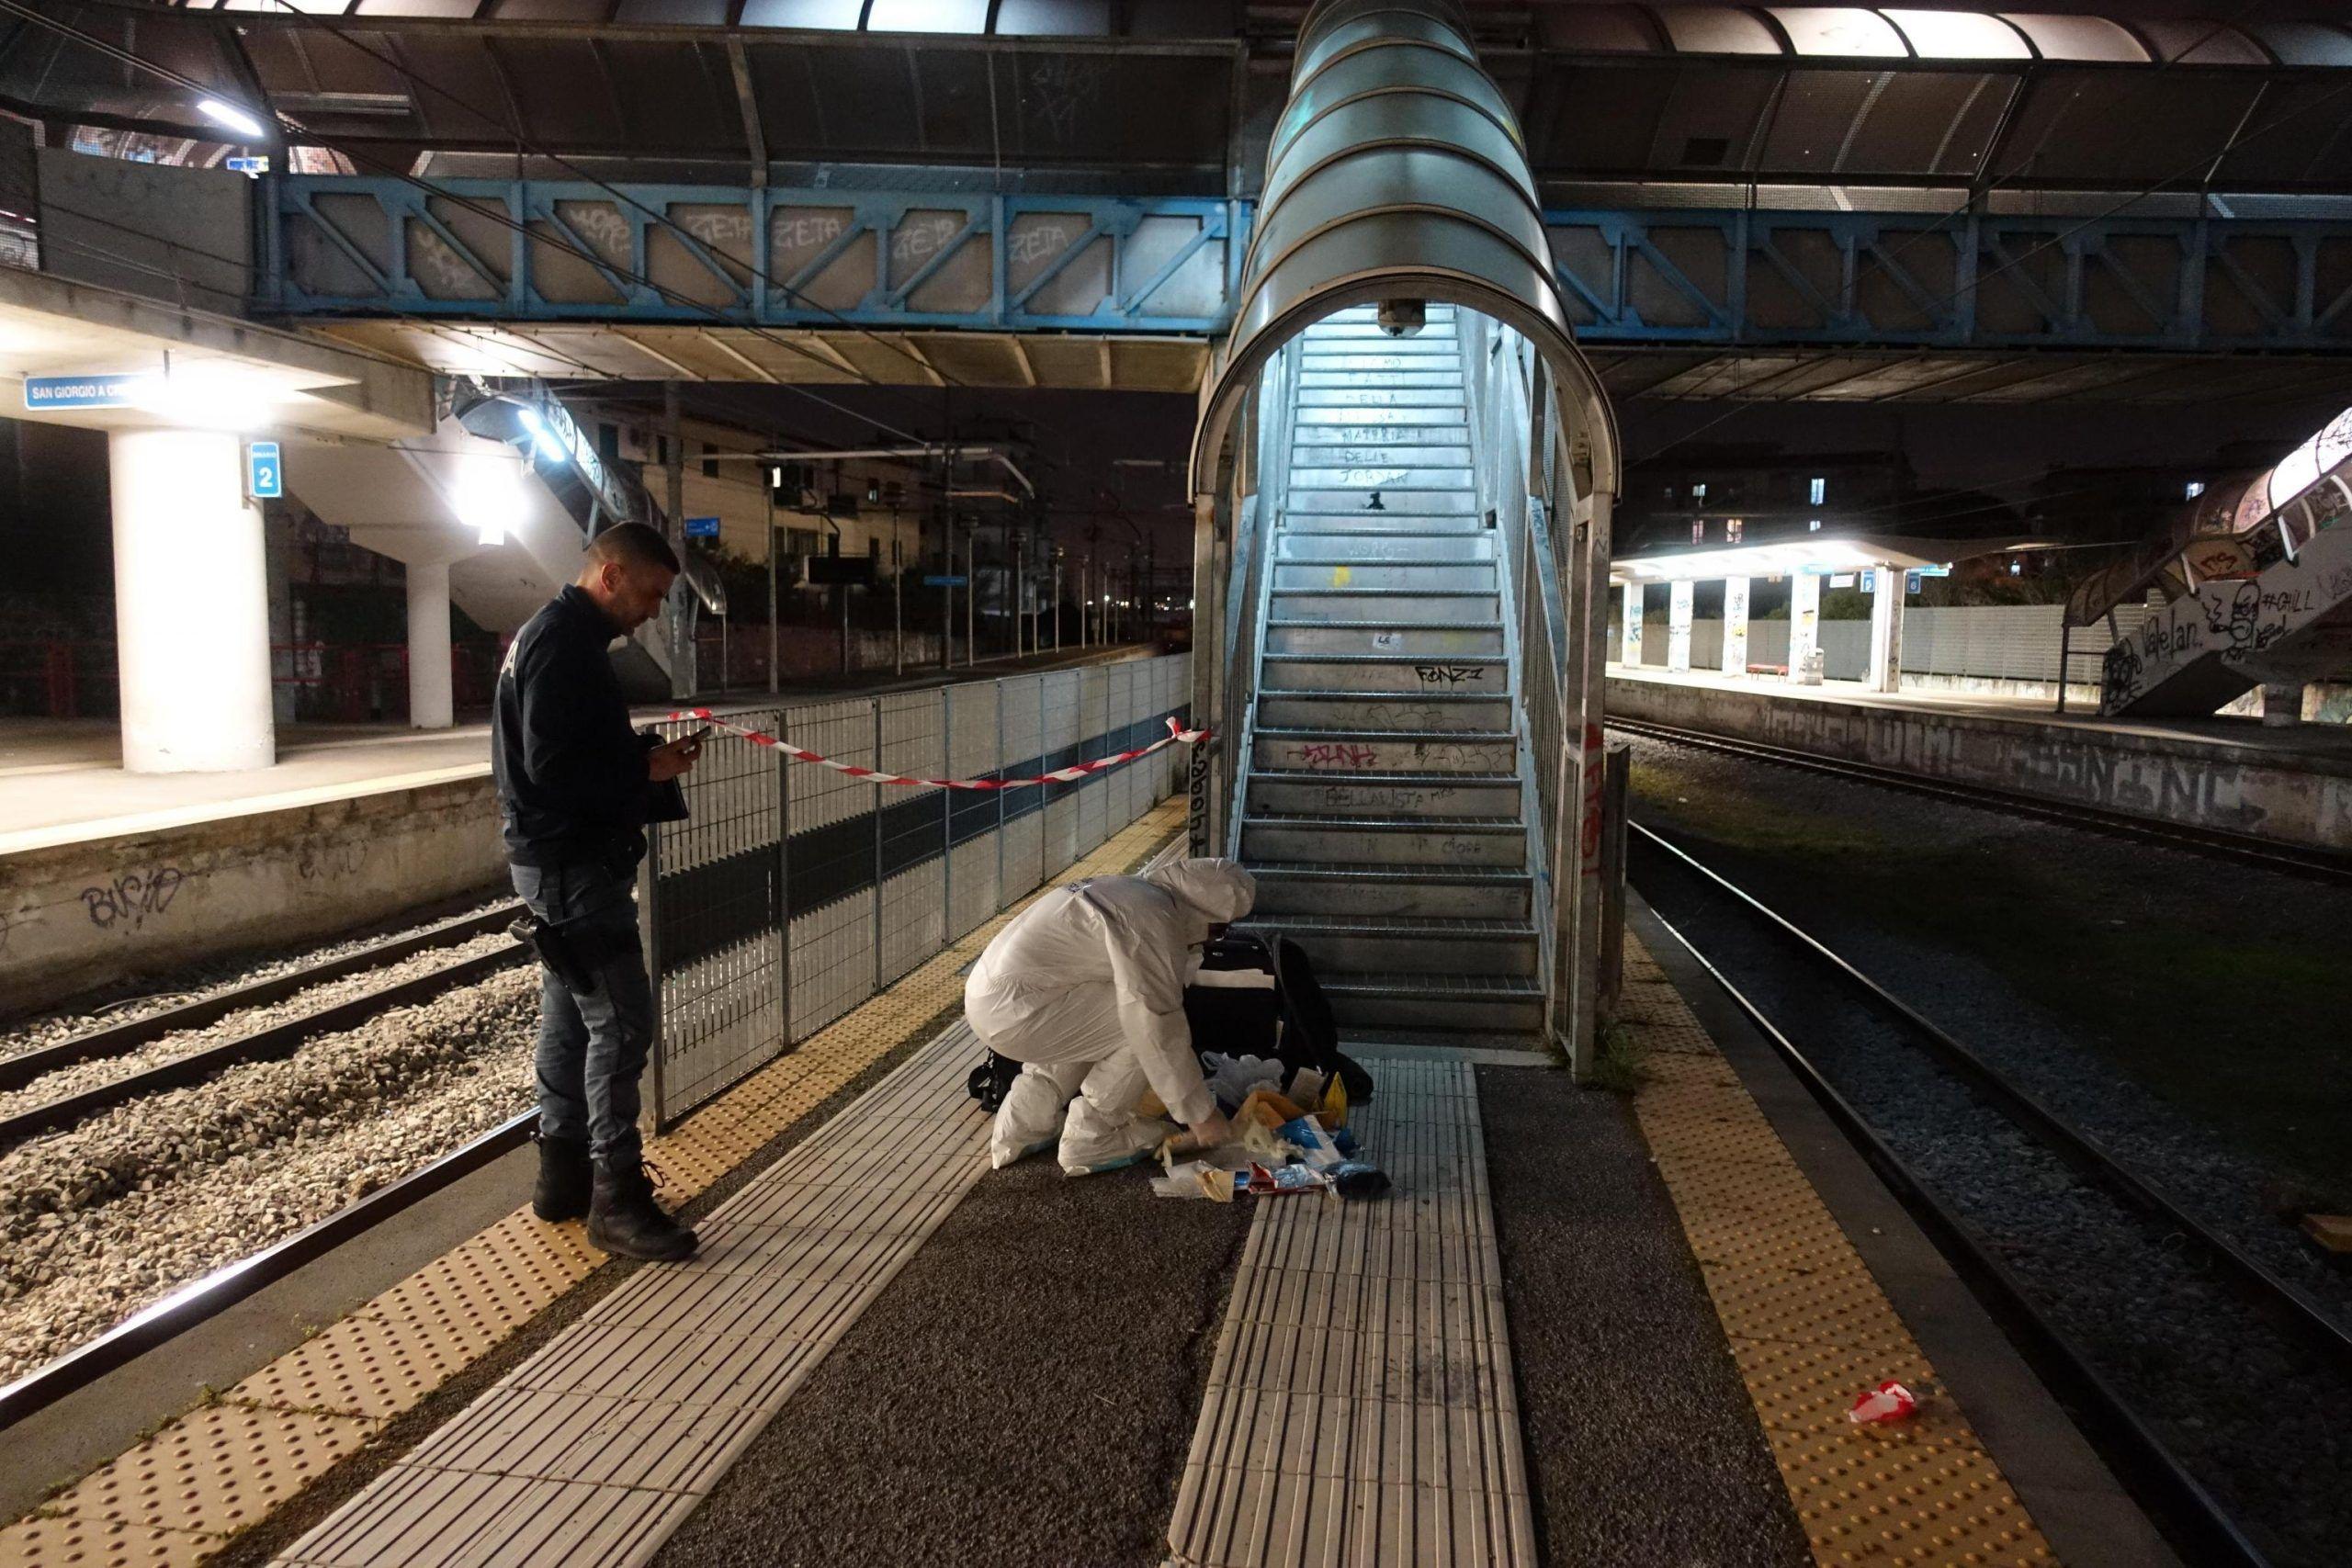 Violentata in stazione